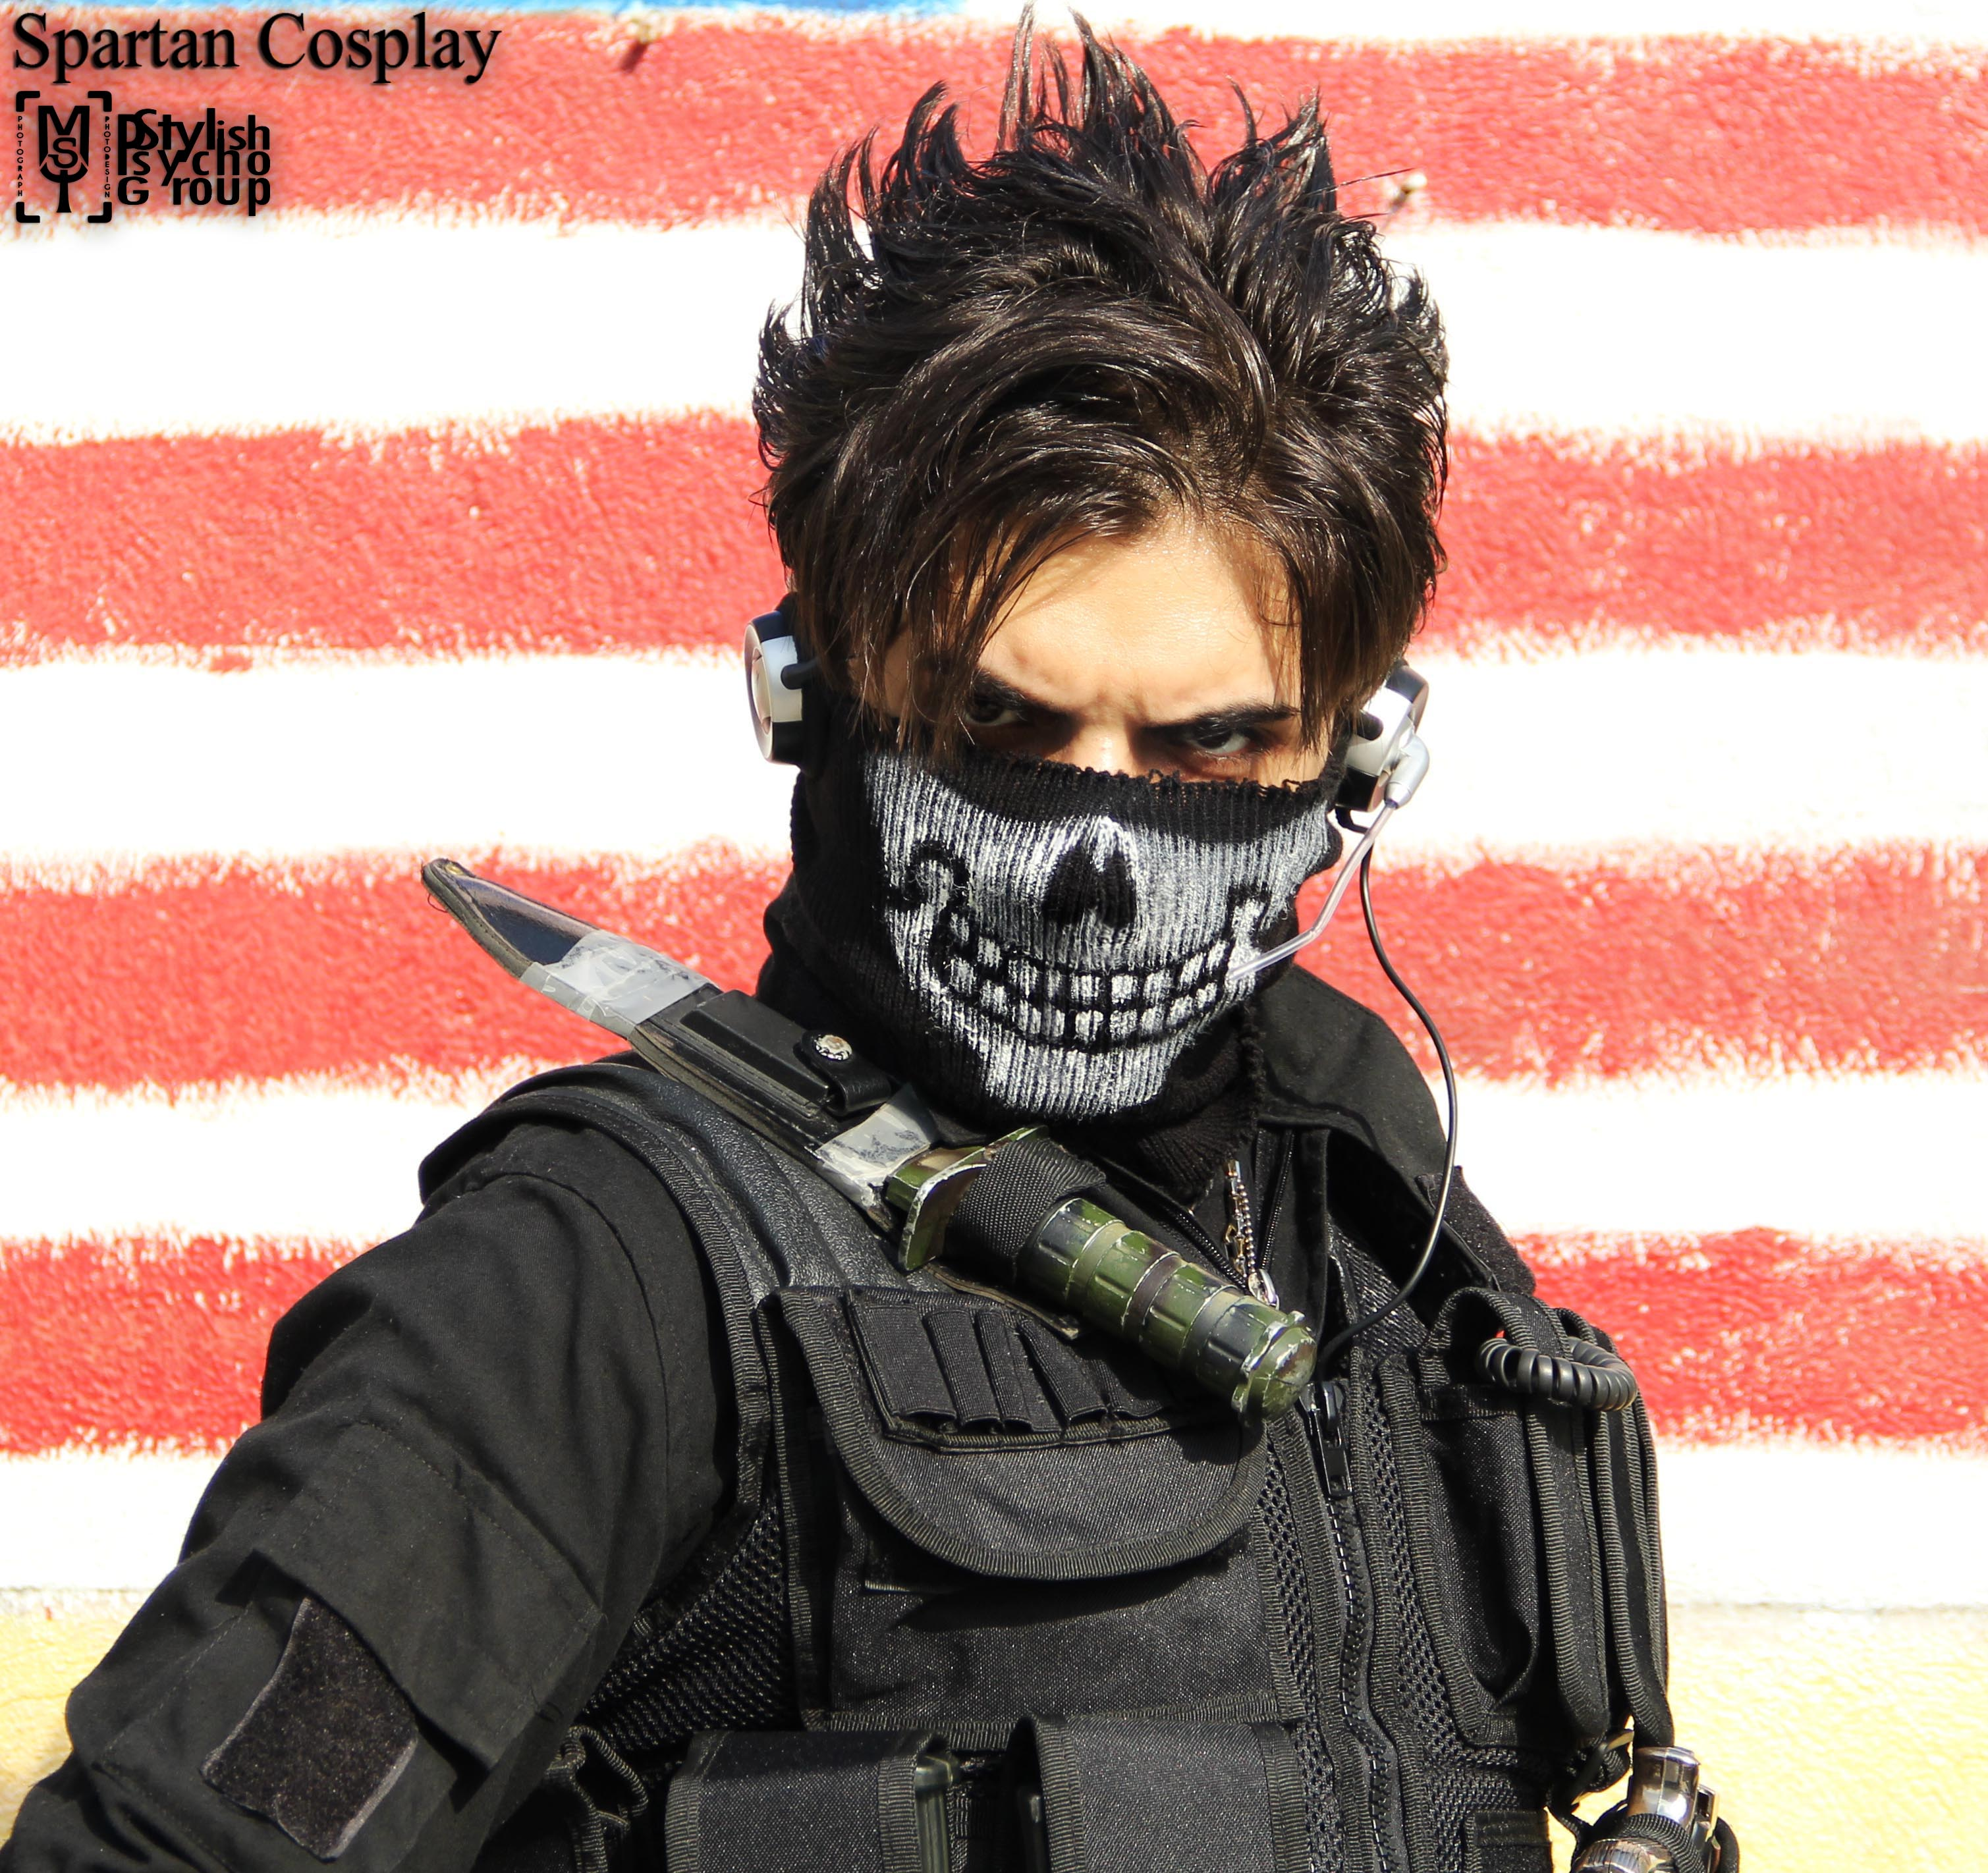 Call Of Duty Ghost Logan Walker Best Cosplay Art By: Call Of Duty Ghost Cosplay By SPARTANalexandra On DeviantArt